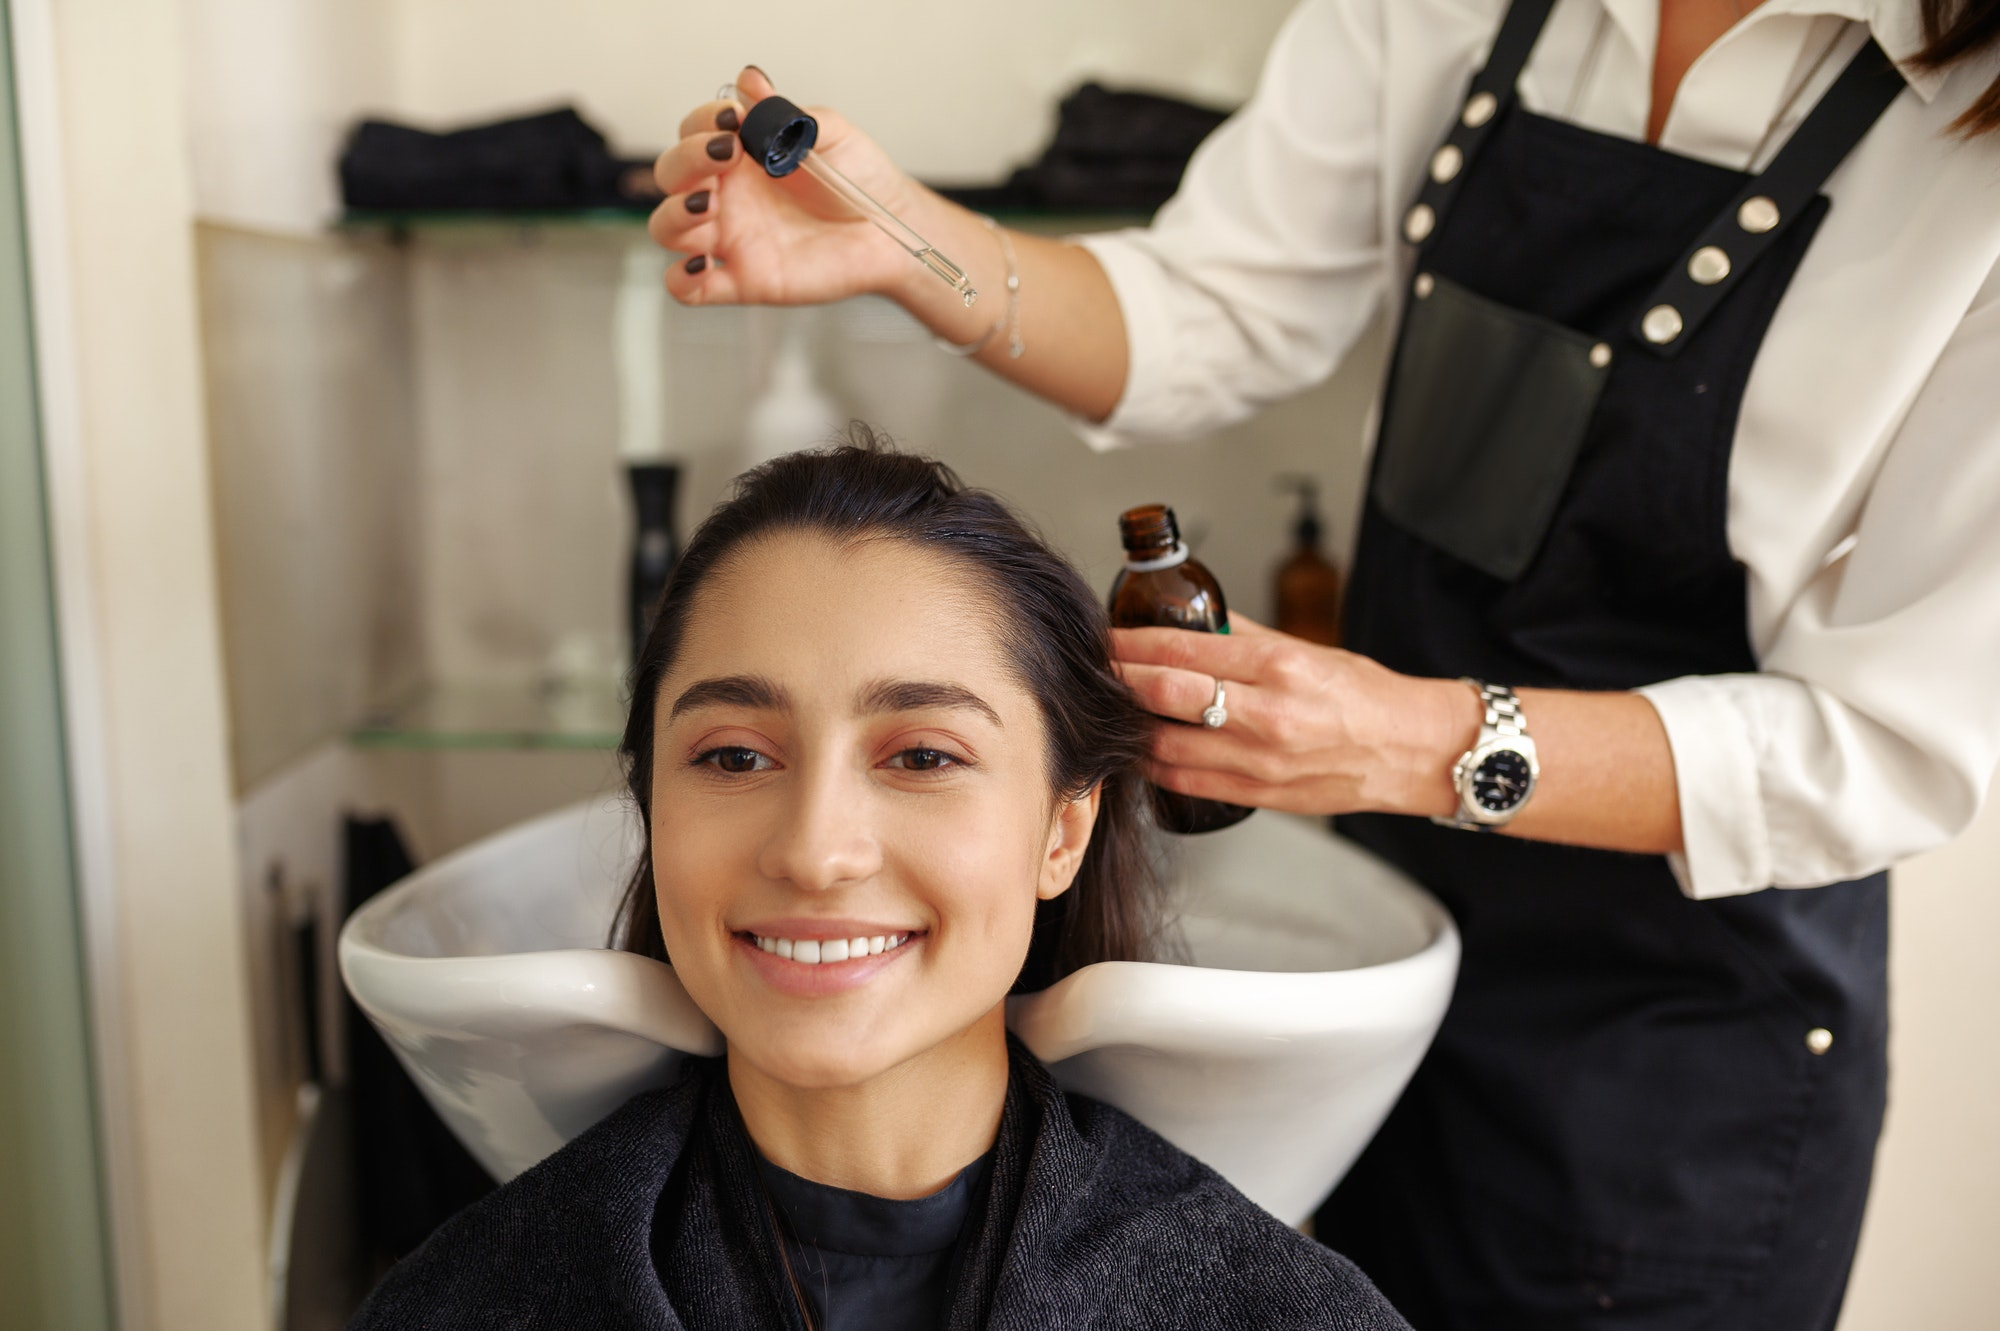 Hairdresser works with hair, hairdressing salon